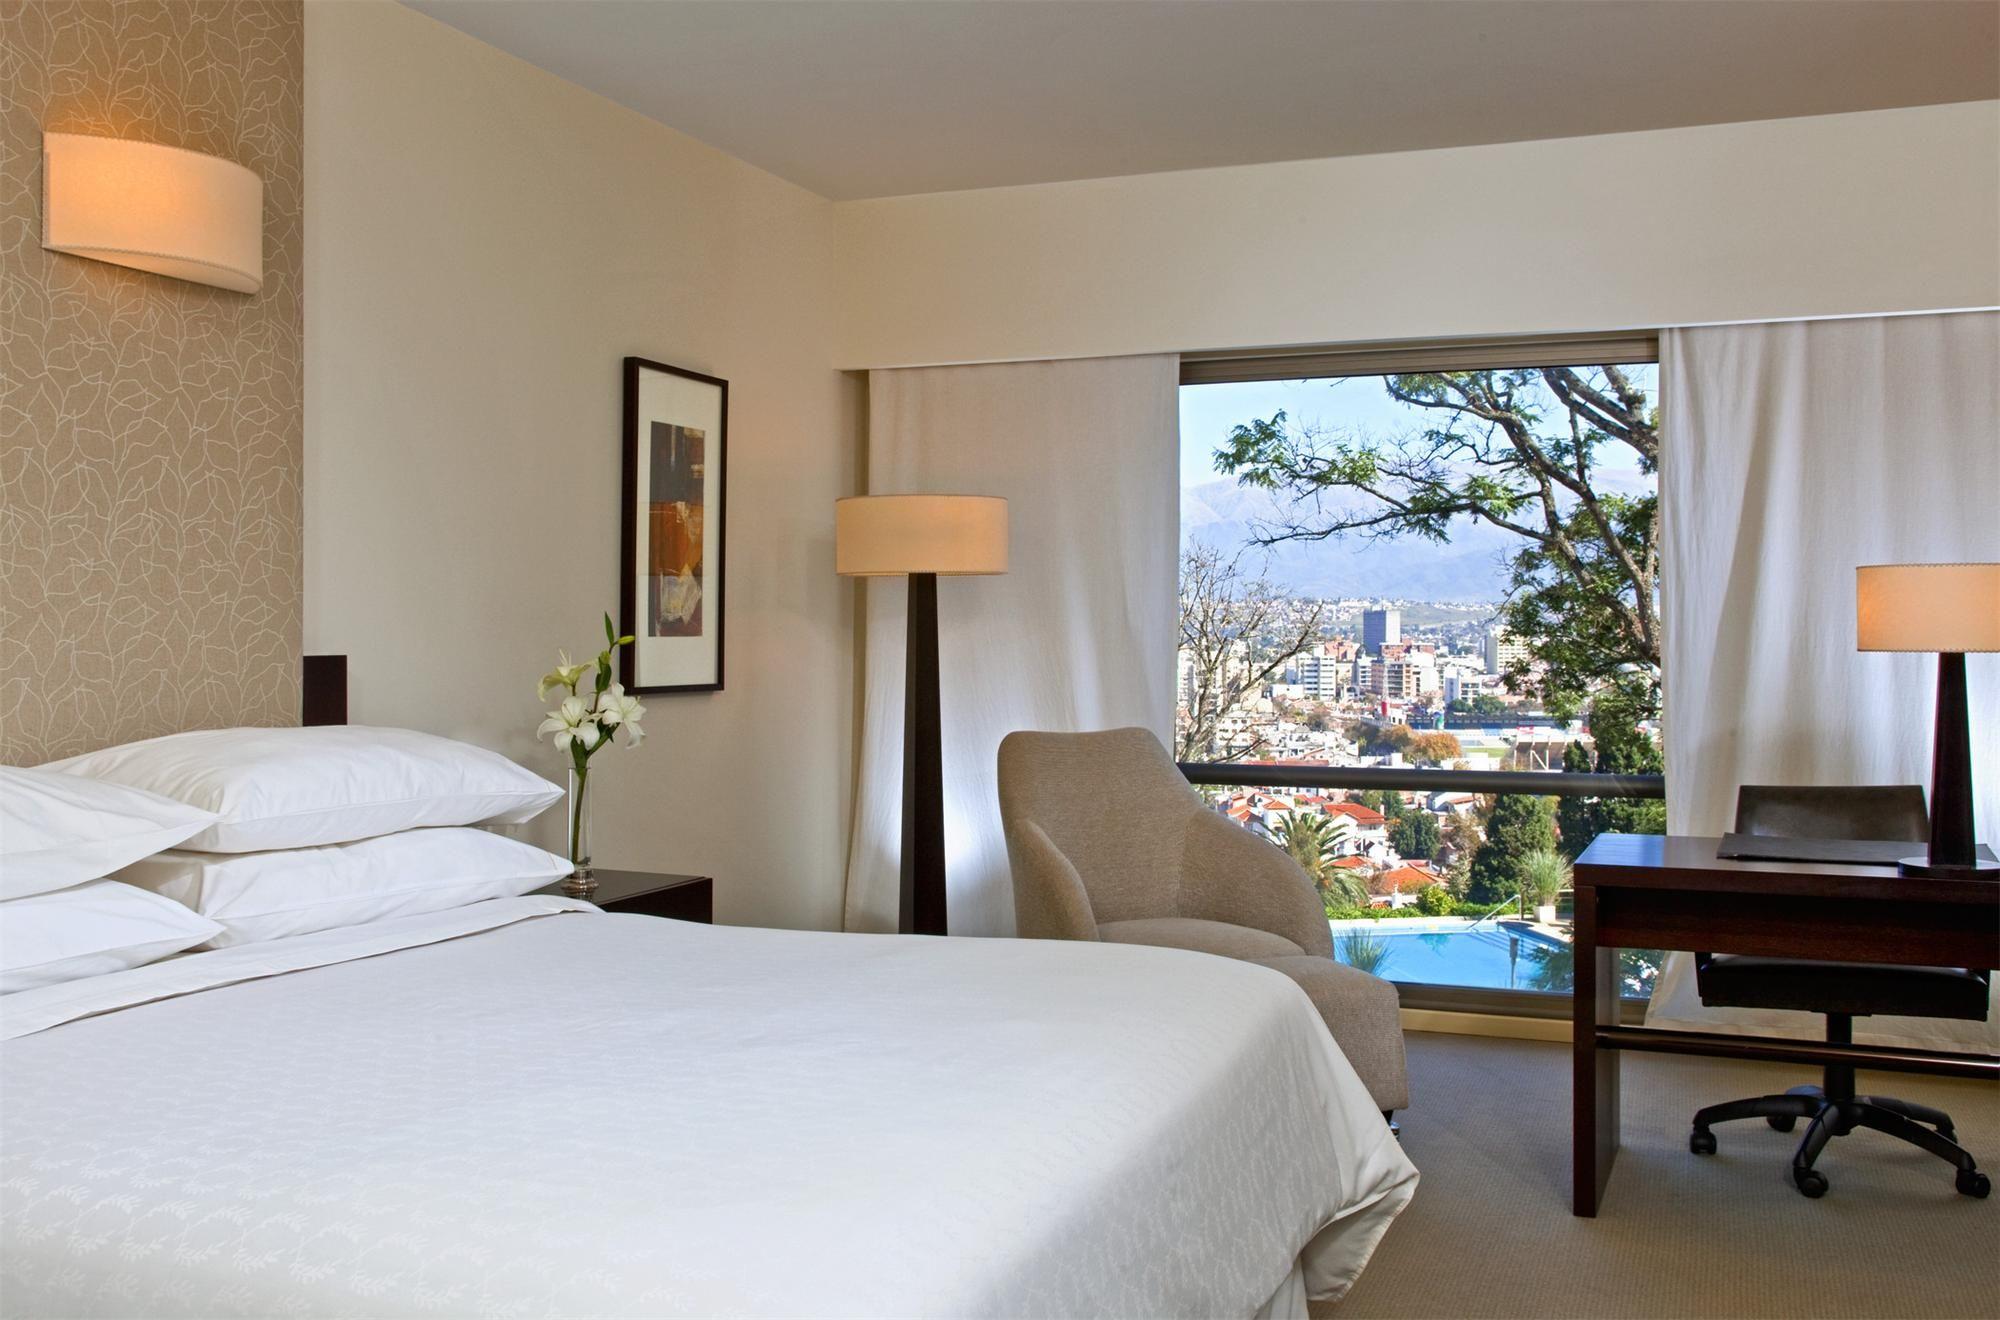 Sheraton salta hotel decoraci n inteligente pinterest habitacion hotel hoteles y decoraci n - Decoracion habitacion hotel ...